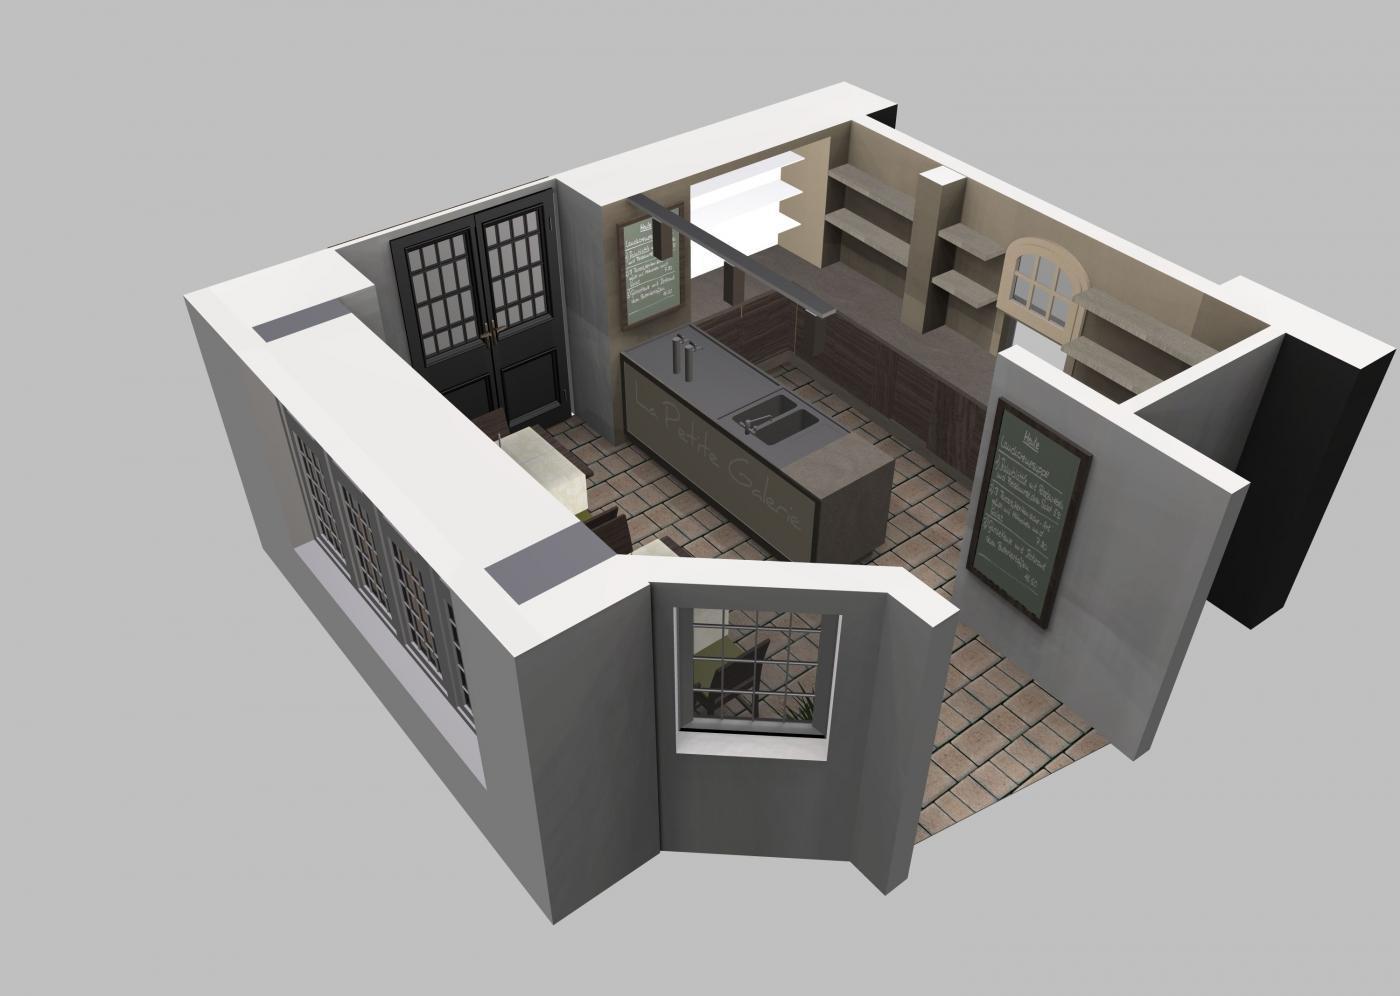 add on arcon 18 rendu 3d architecture professionnelle. Black Bedroom Furniture Sets. Home Design Ideas